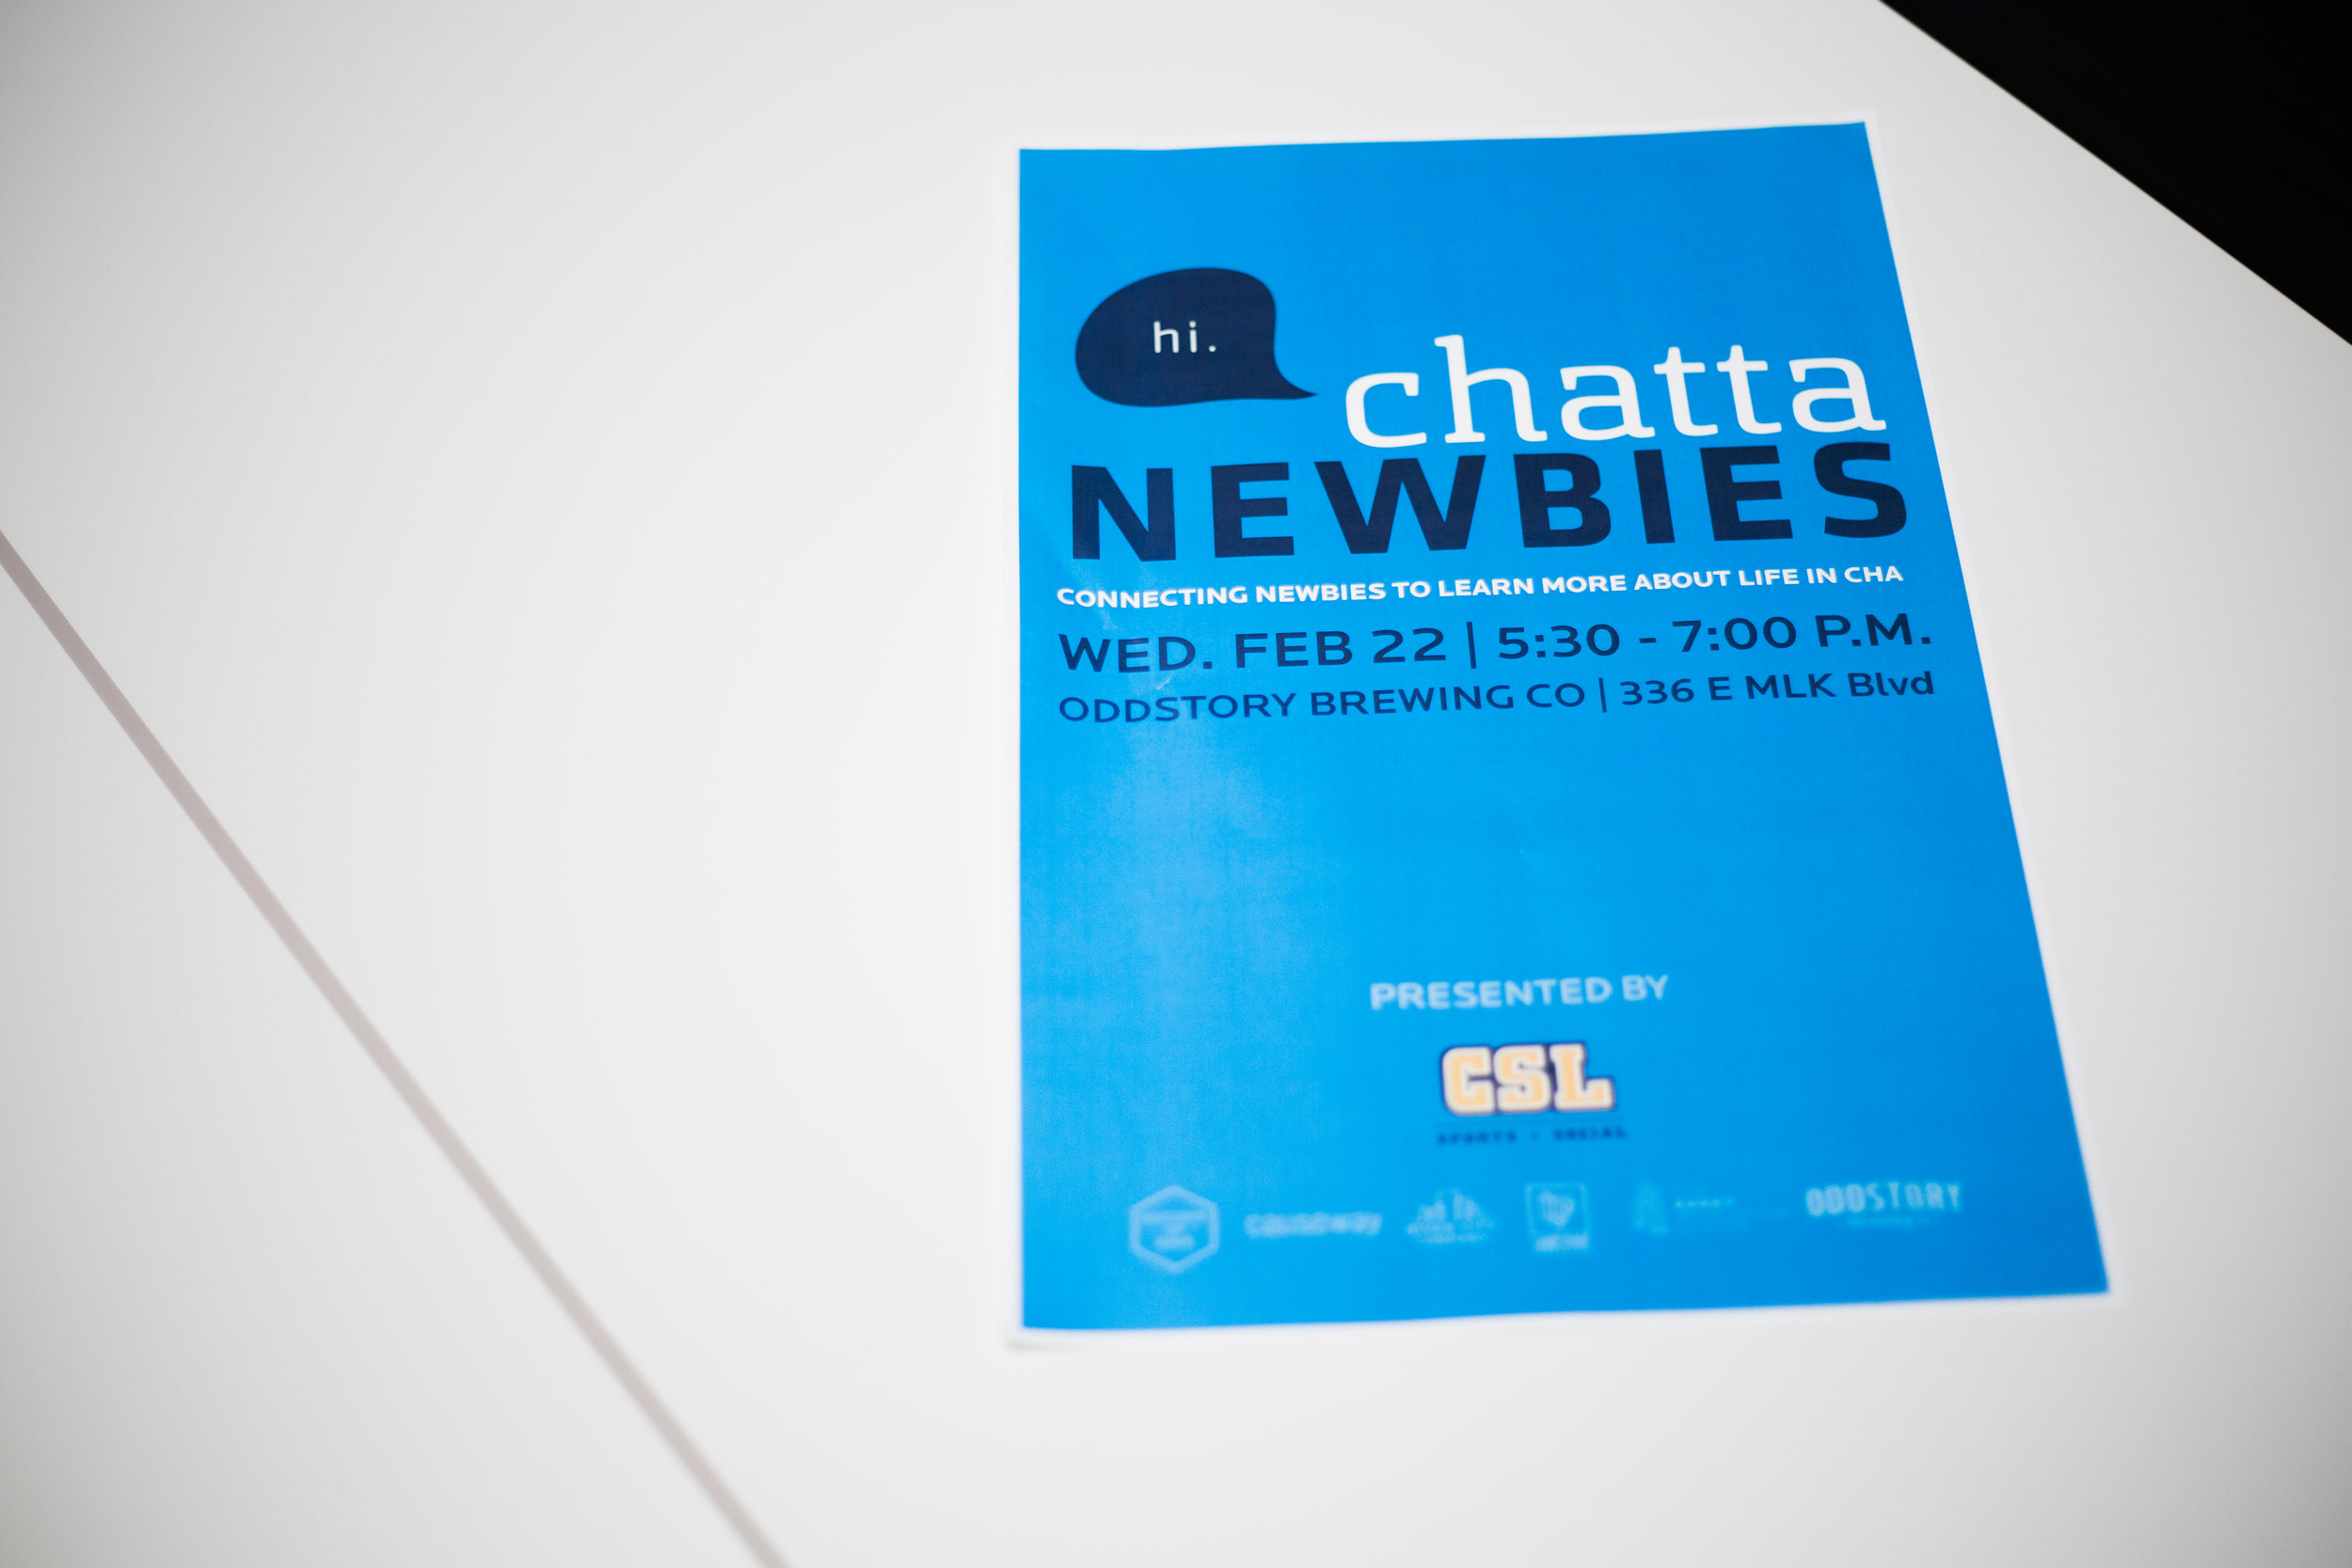 Chattanewbies-31.jpg